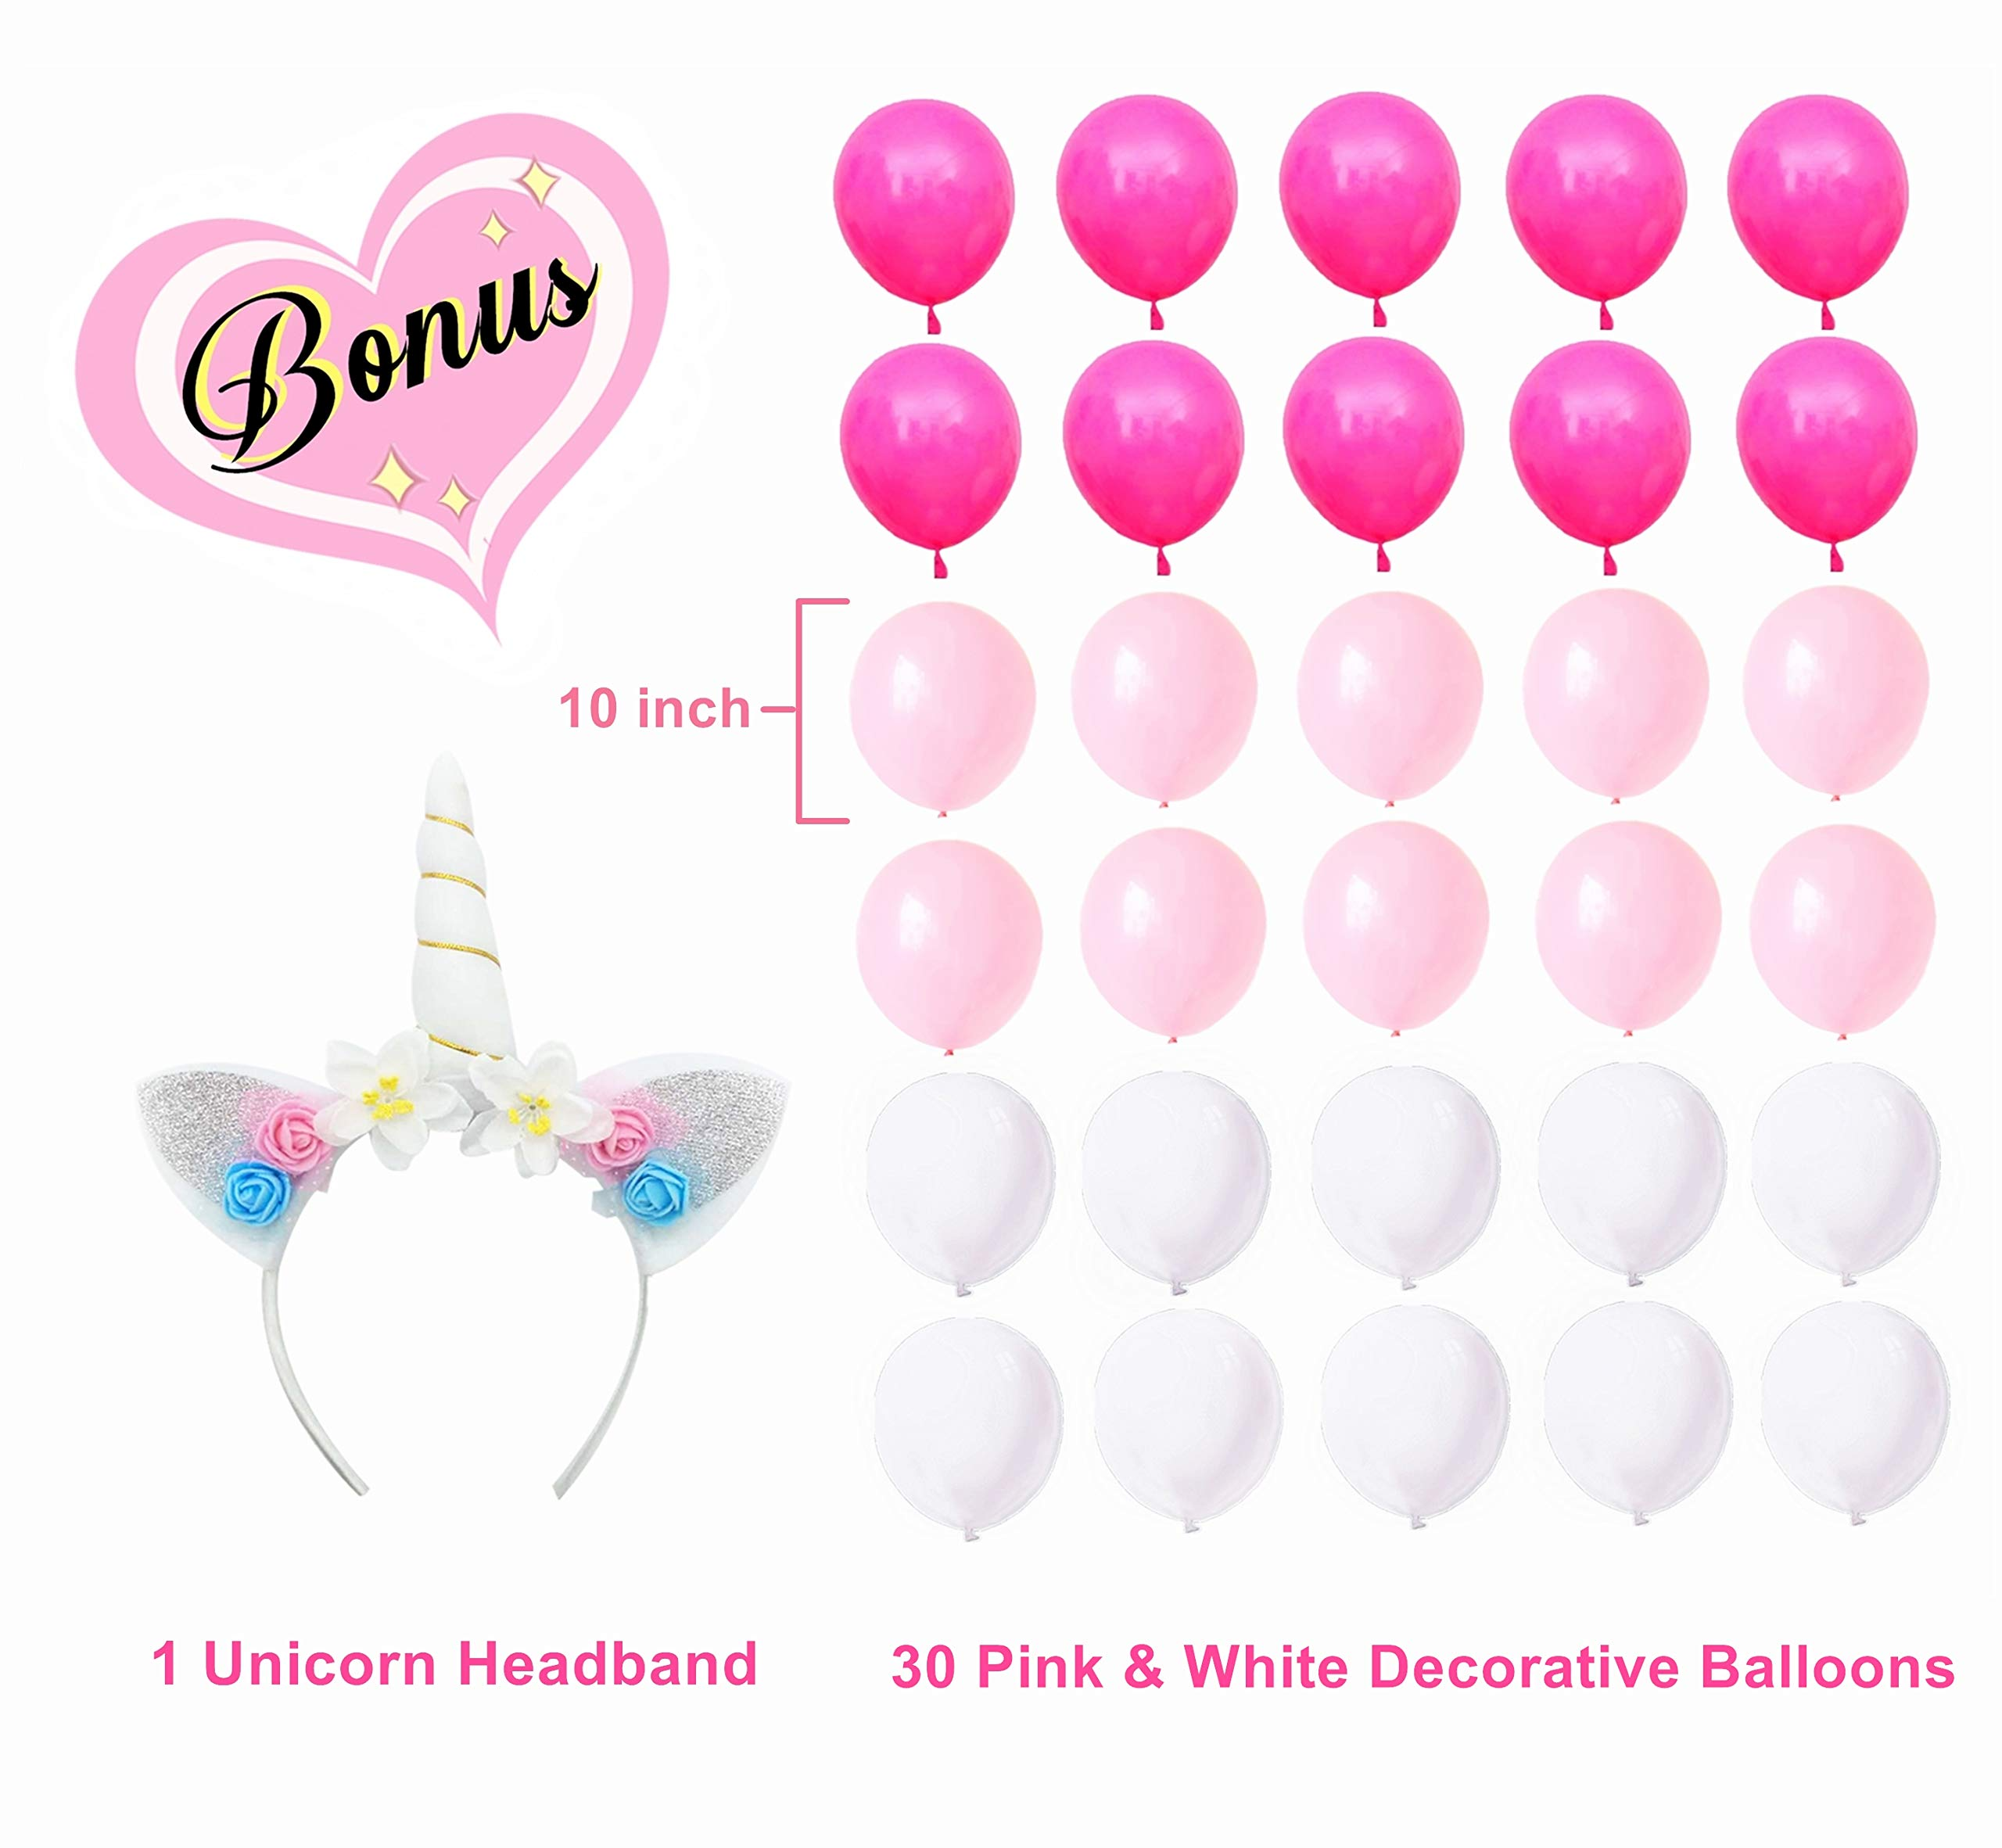 Unicorn Party Supplies Set with BONUS Glittery Unicorn Headband and 30 Balloons   145 Piece Disposable Unicorn Themed… 6